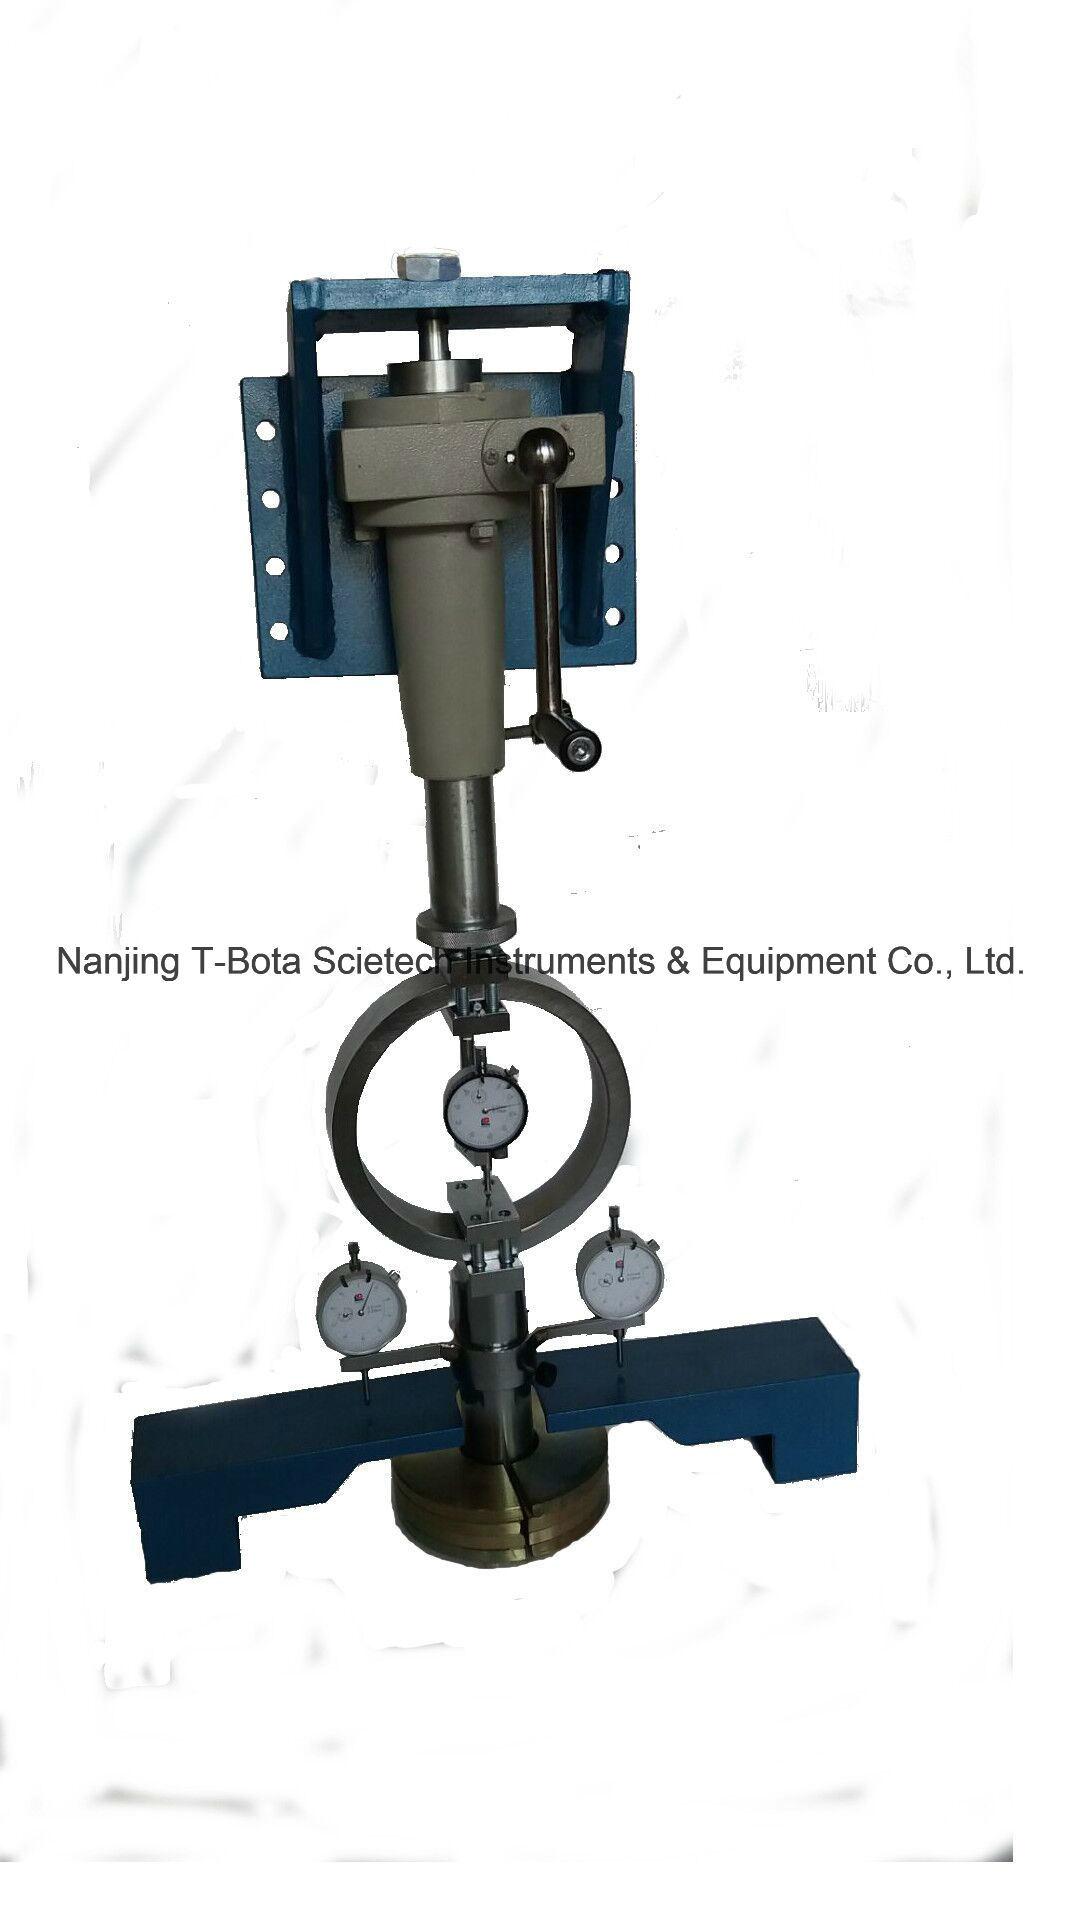 LCB-2 CBR Value Testing Apparatus